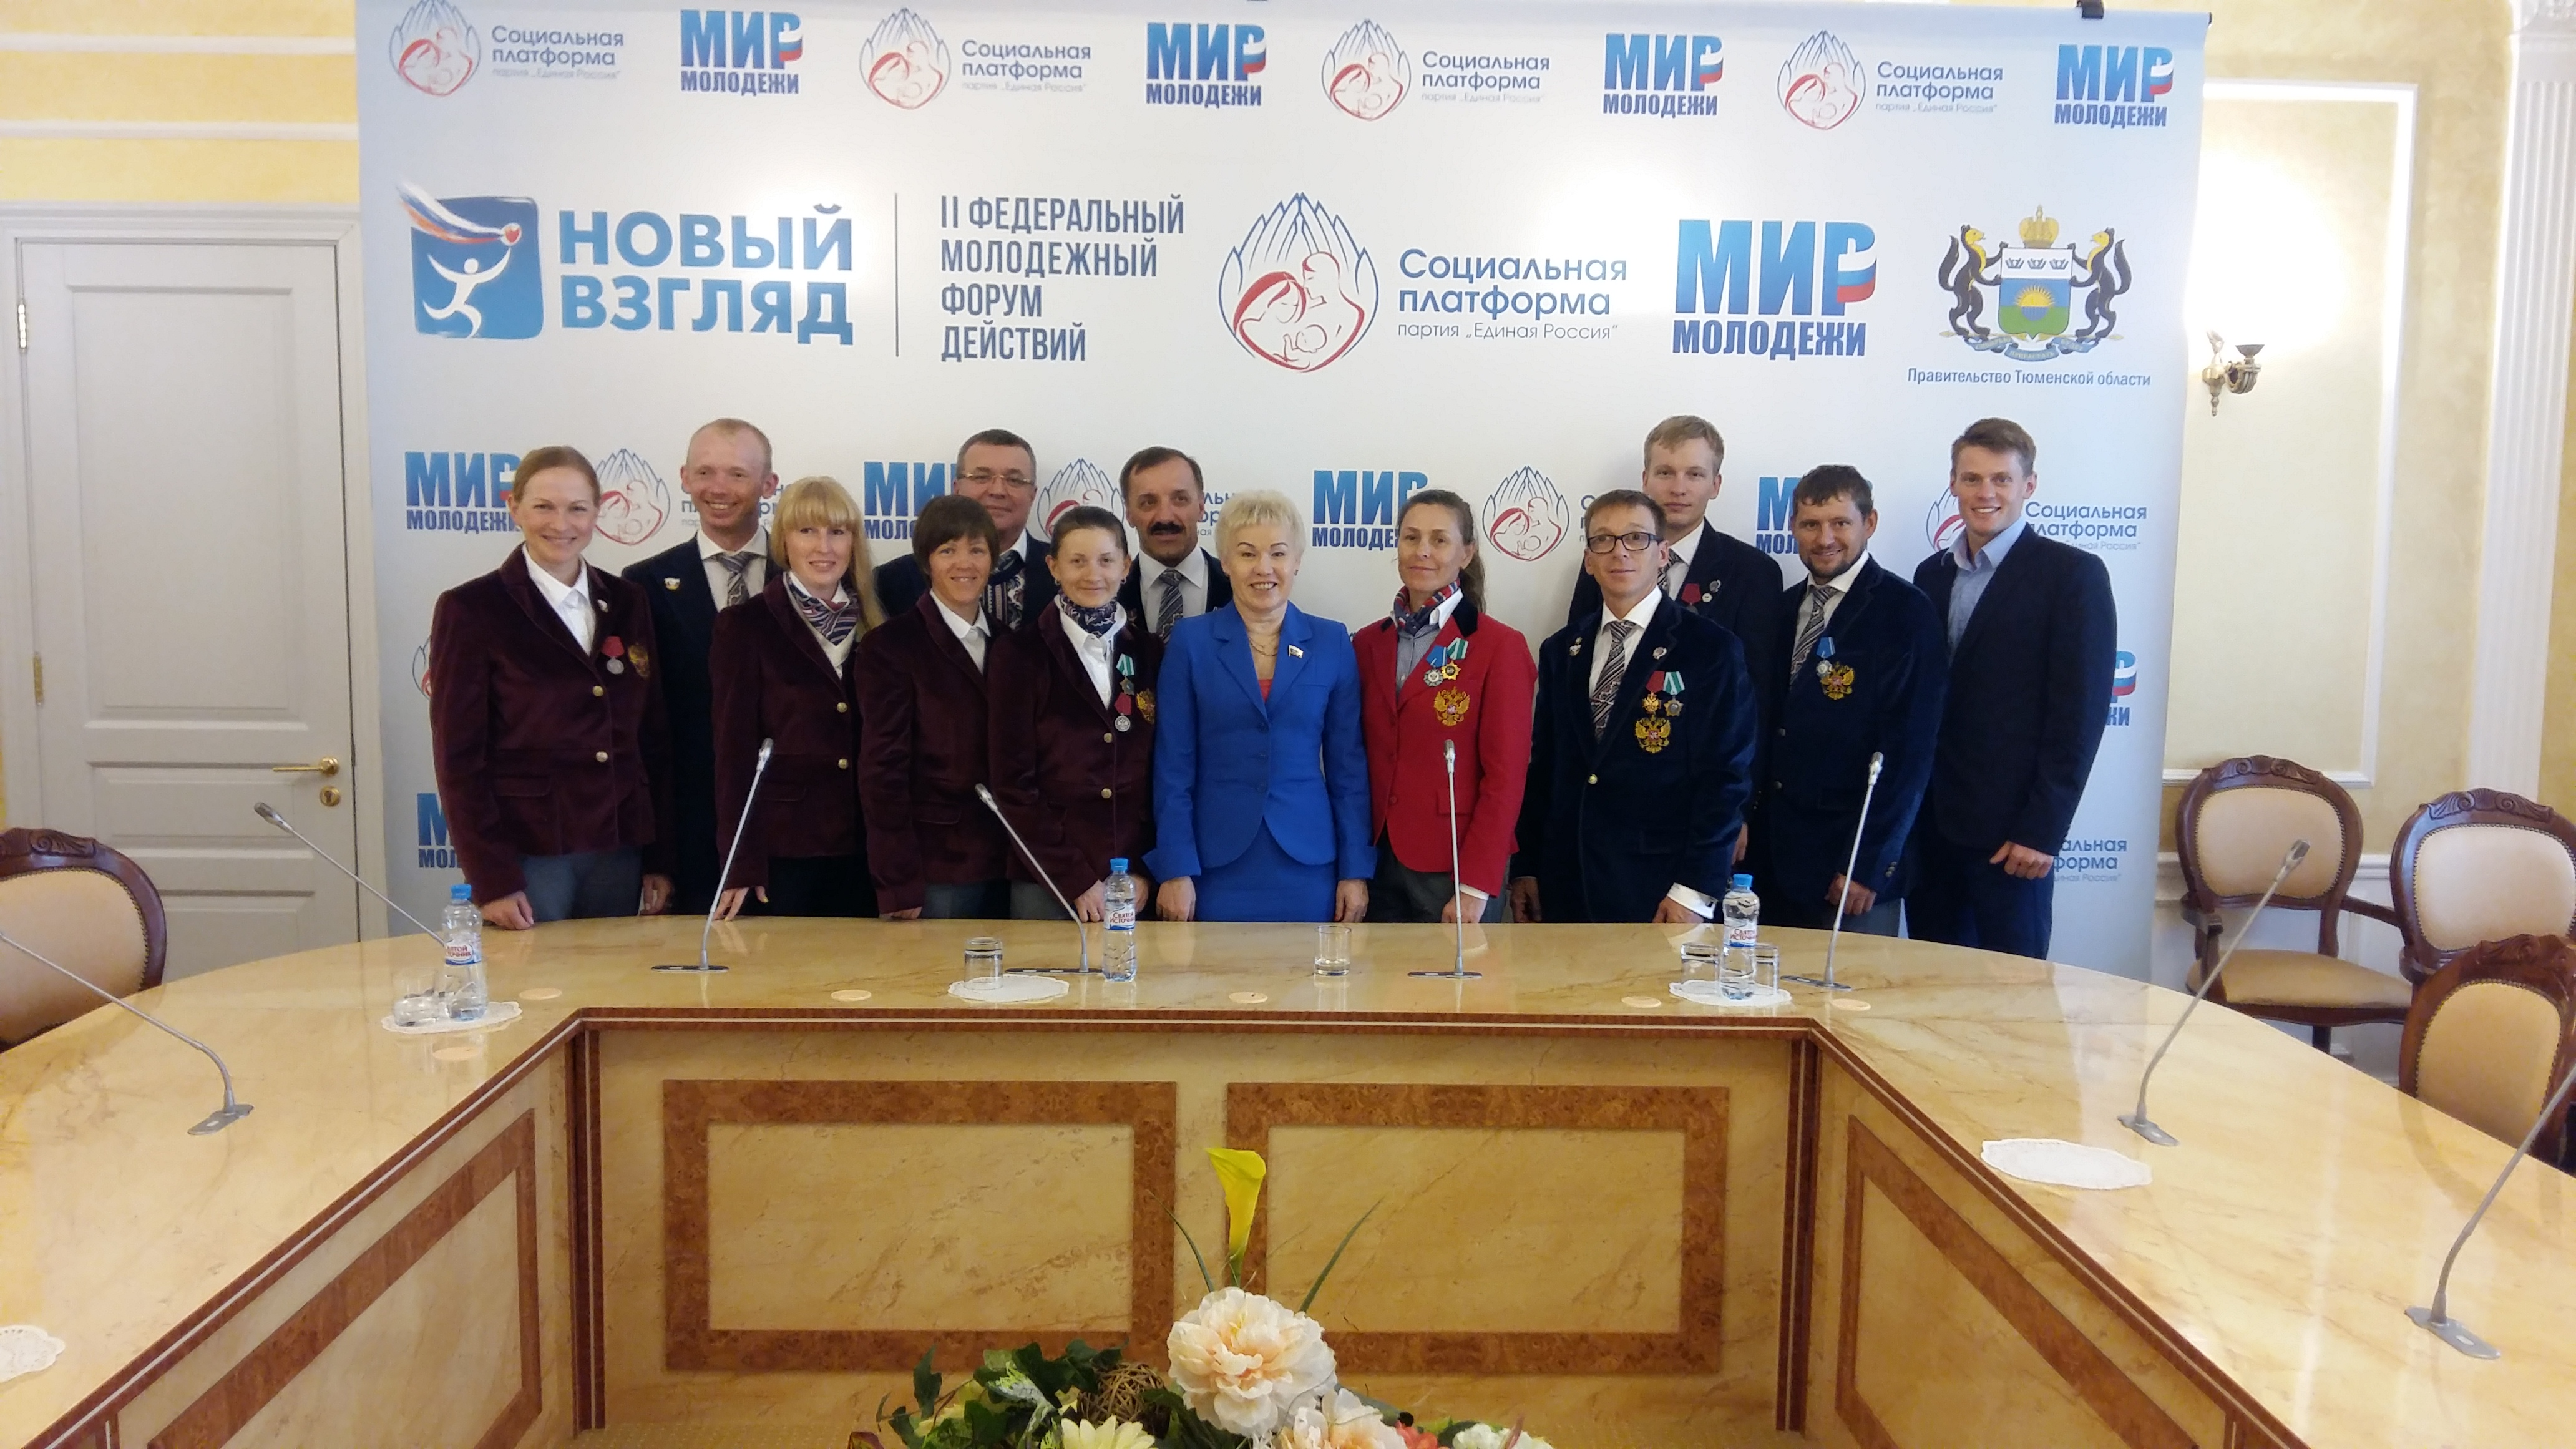 Р.А. Баталова в г. Тюмени провела встречу со спортсменами-паралимпийцами Тюменской области